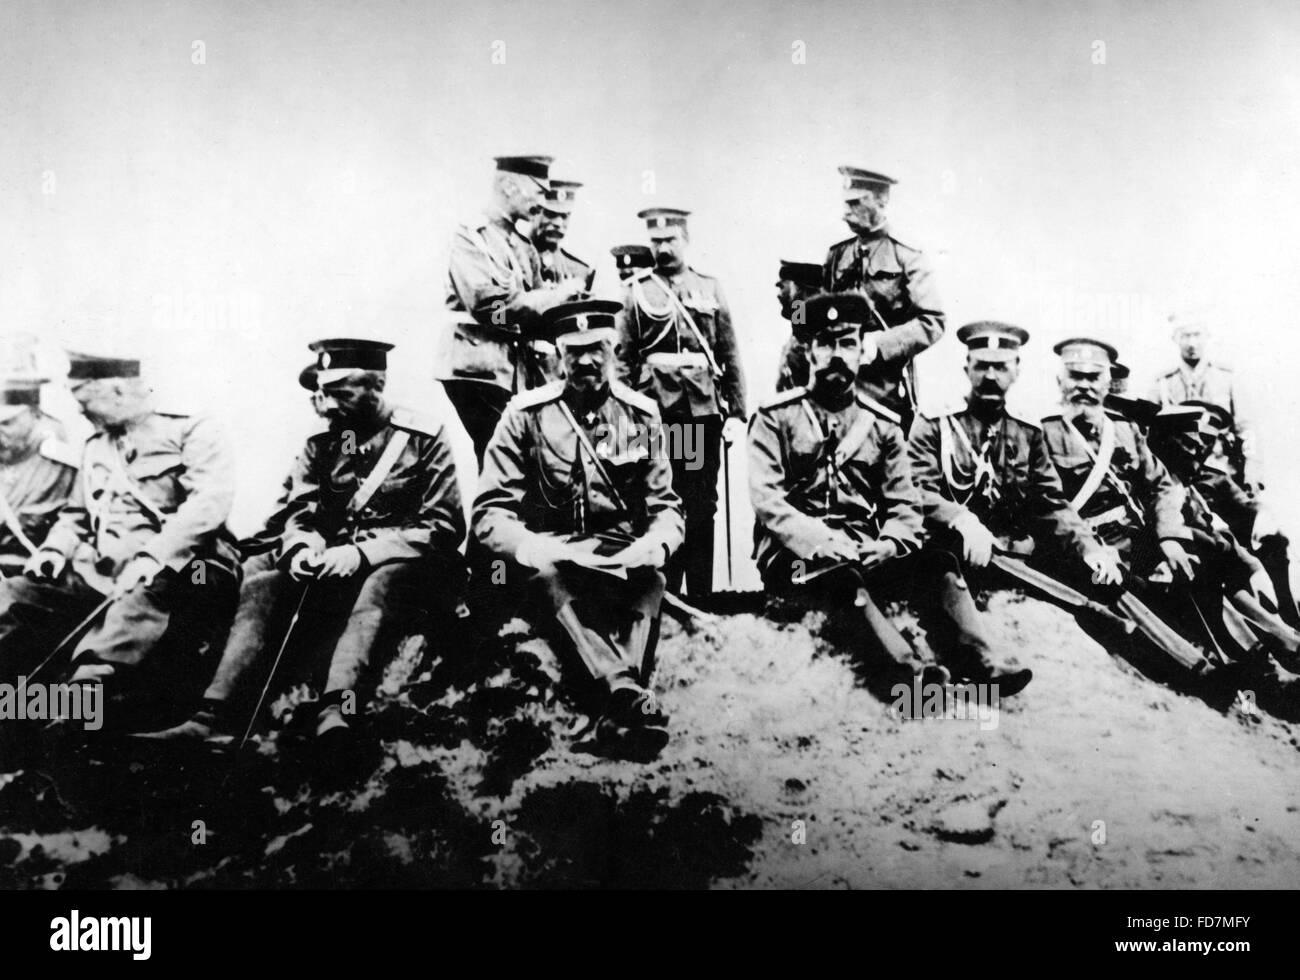 Tsar Nikolaus II. during a military manoeuvre, 1912 - Stock Image